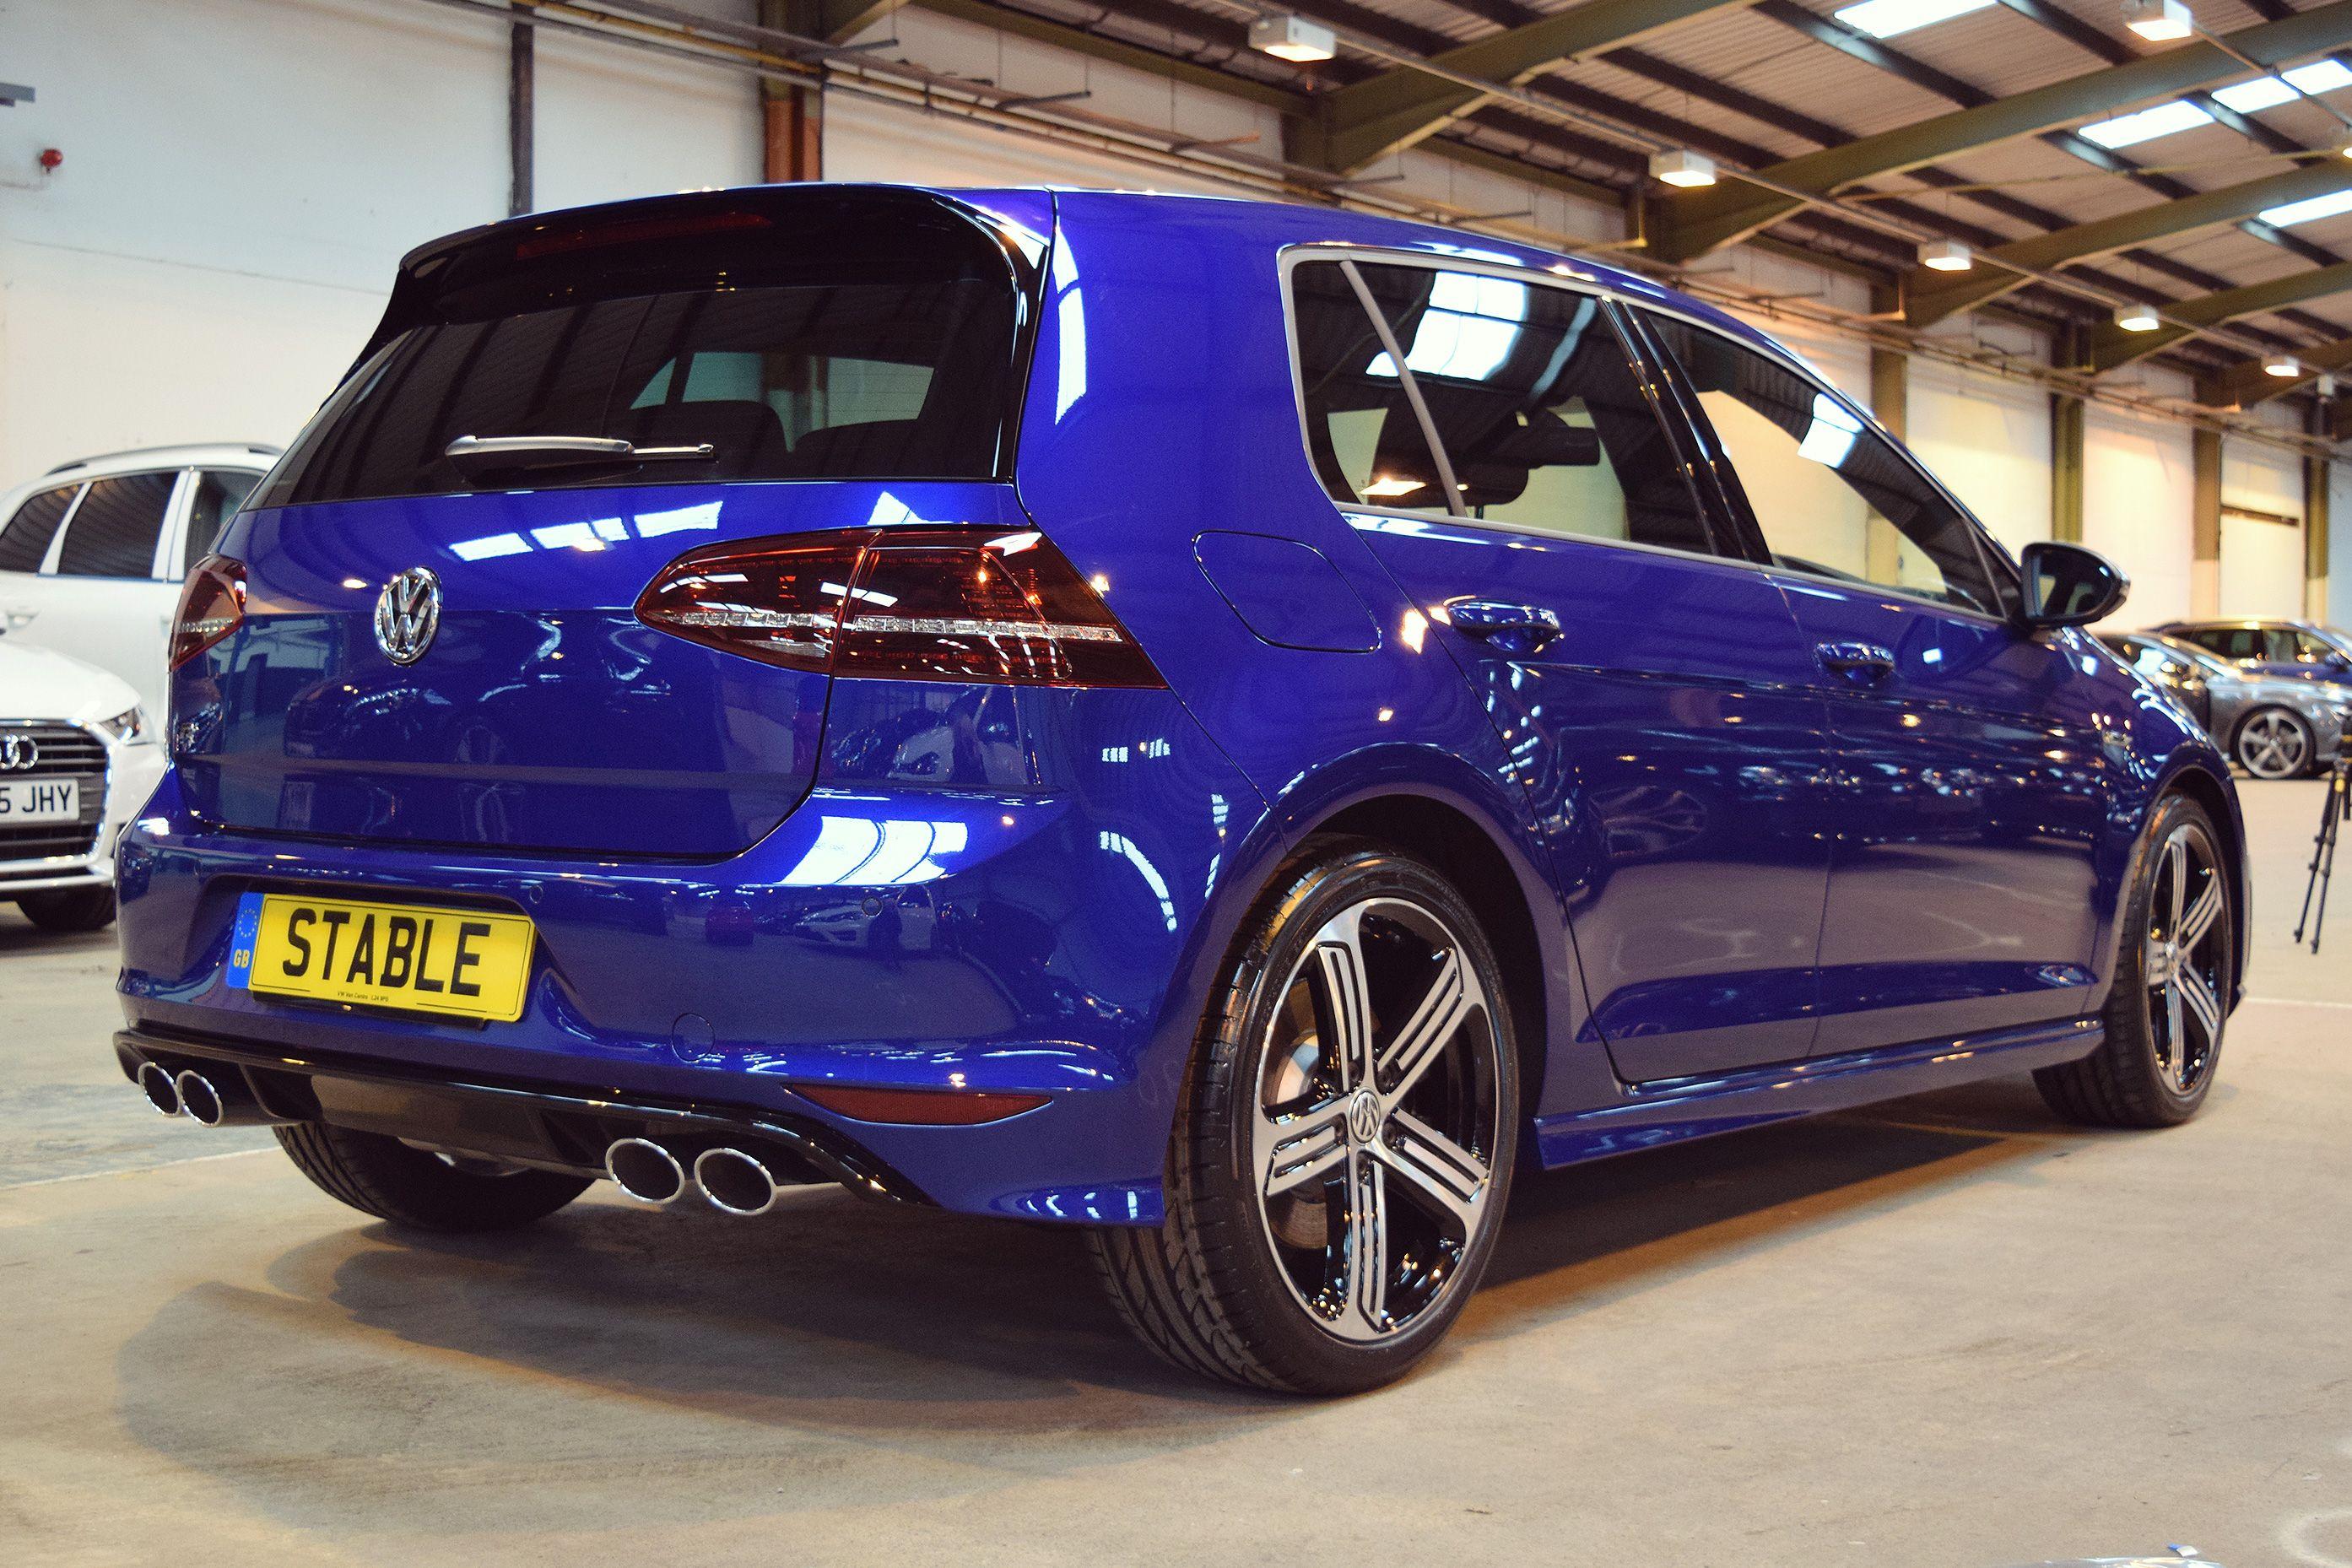 2016 Volkswagen Golf R In Lapiz Blue Volkswagen Vw Golf Vr6